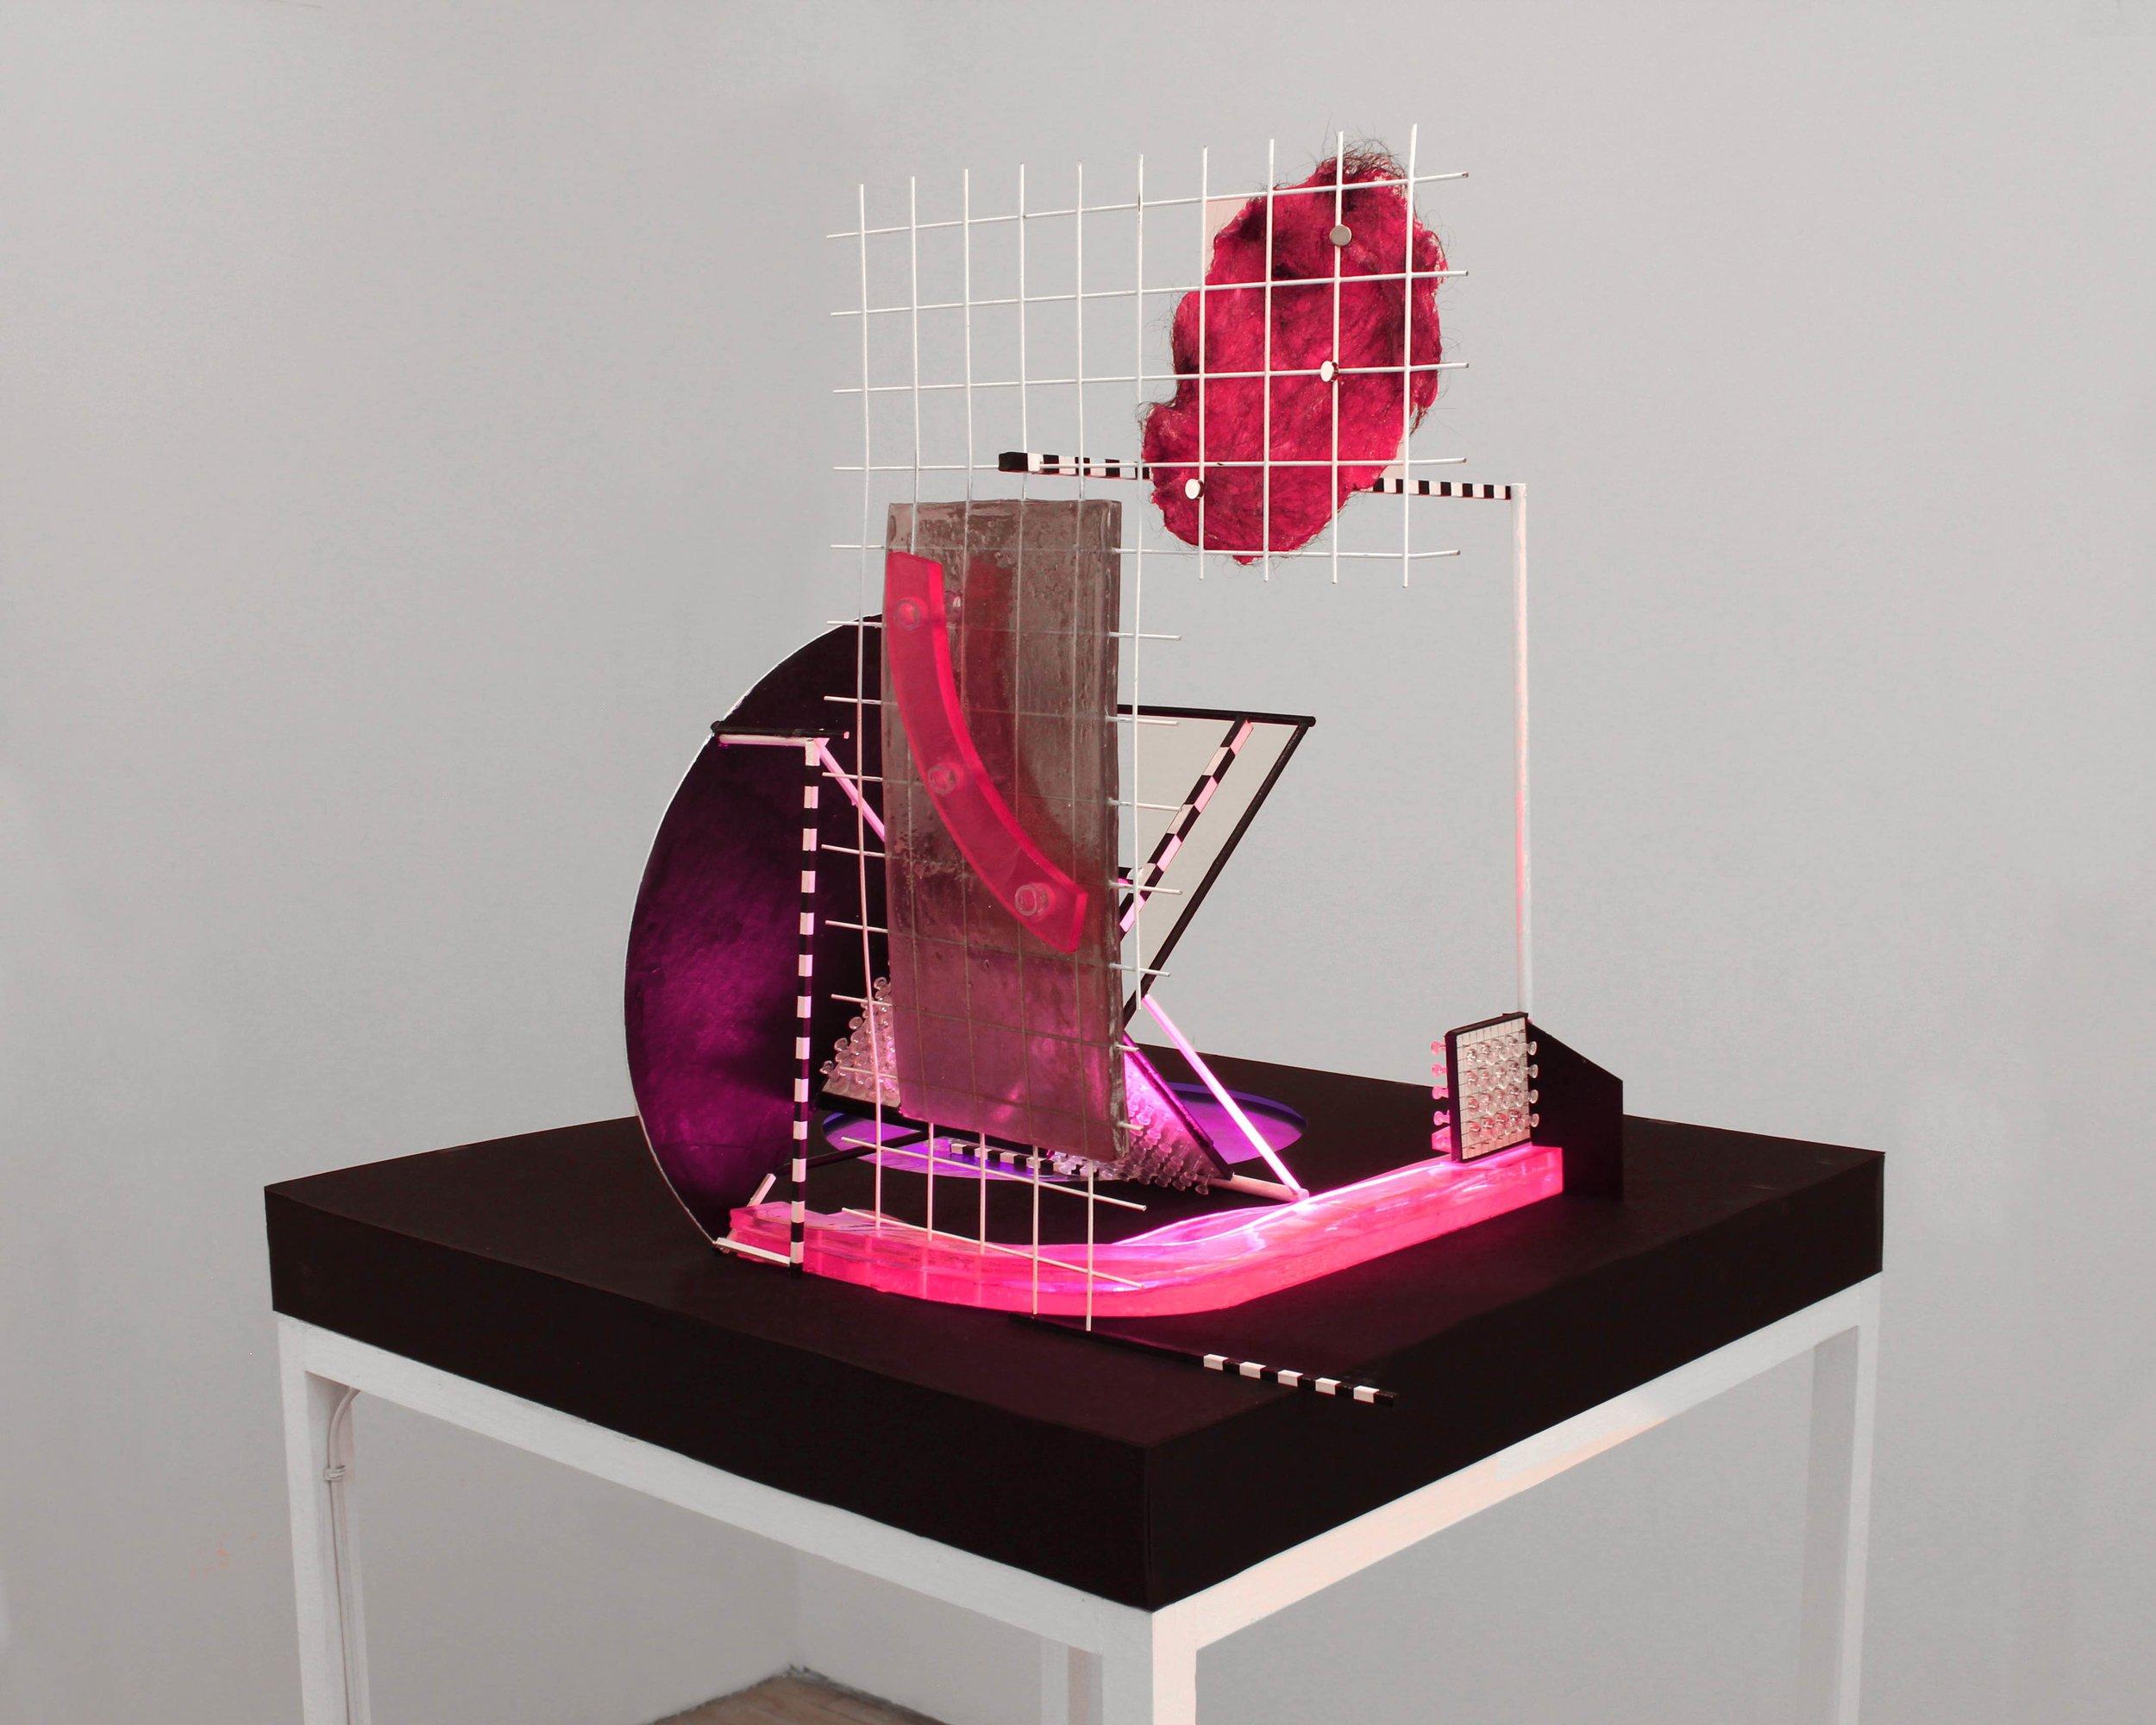 pink_2_back_fix_(S).jpg